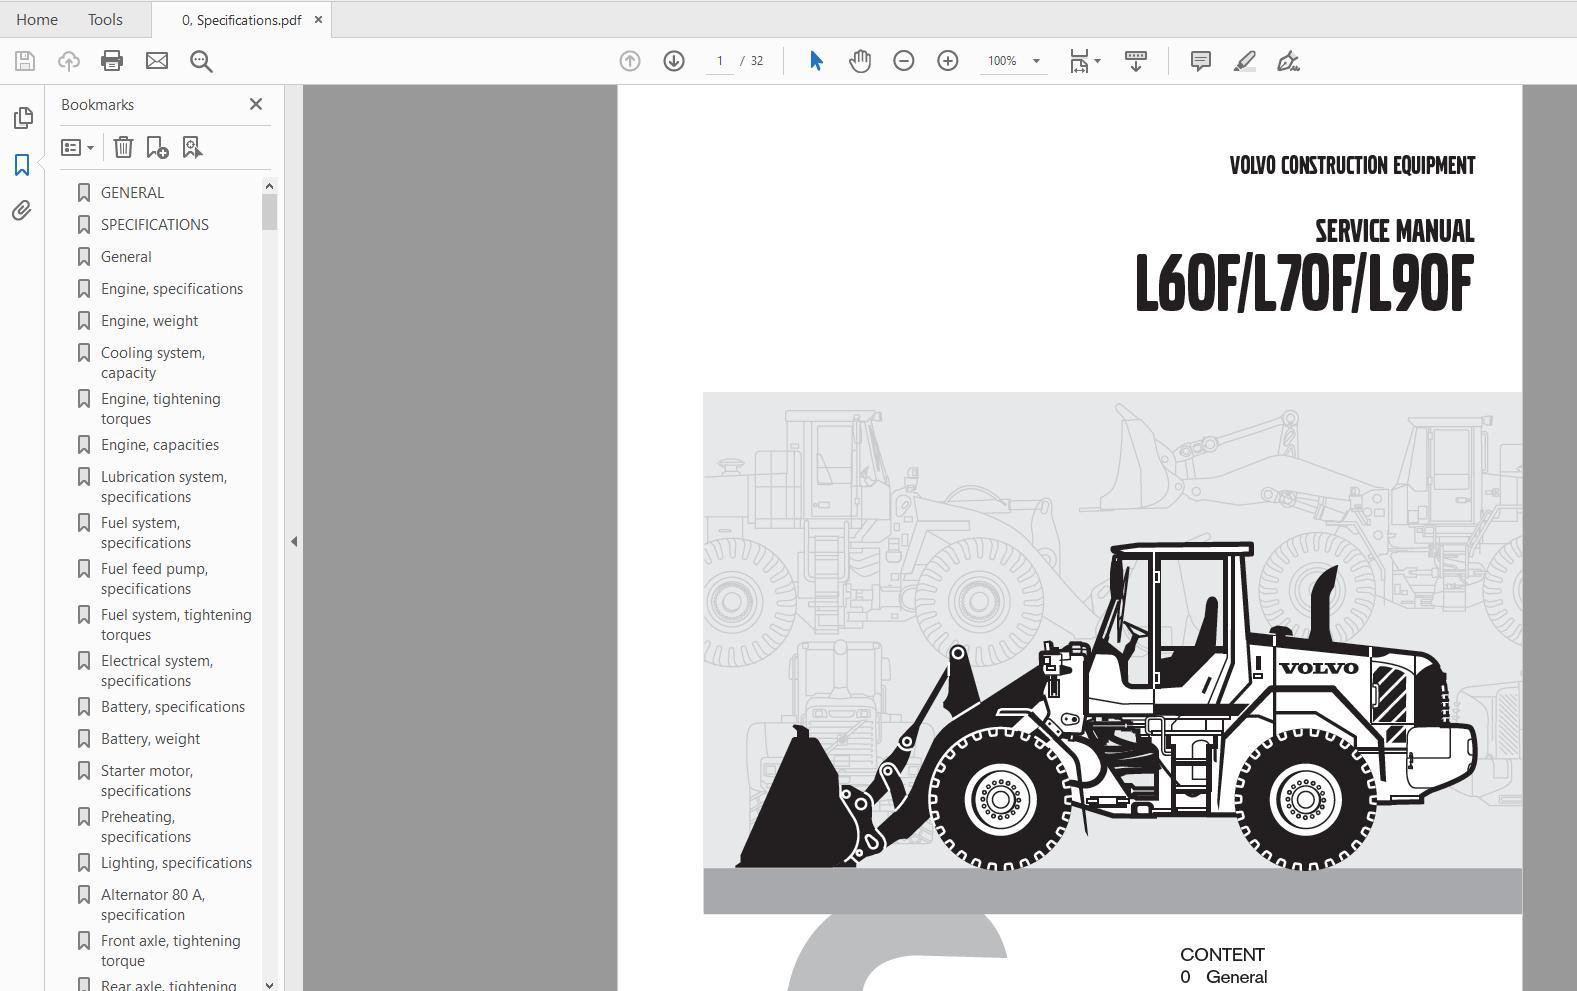 volvo wheel loader l60f,l70f,l90f service manual   auto repair manual forum  - heavy equipment forums - download repair & workshop manual  autorepairmanuals.ws